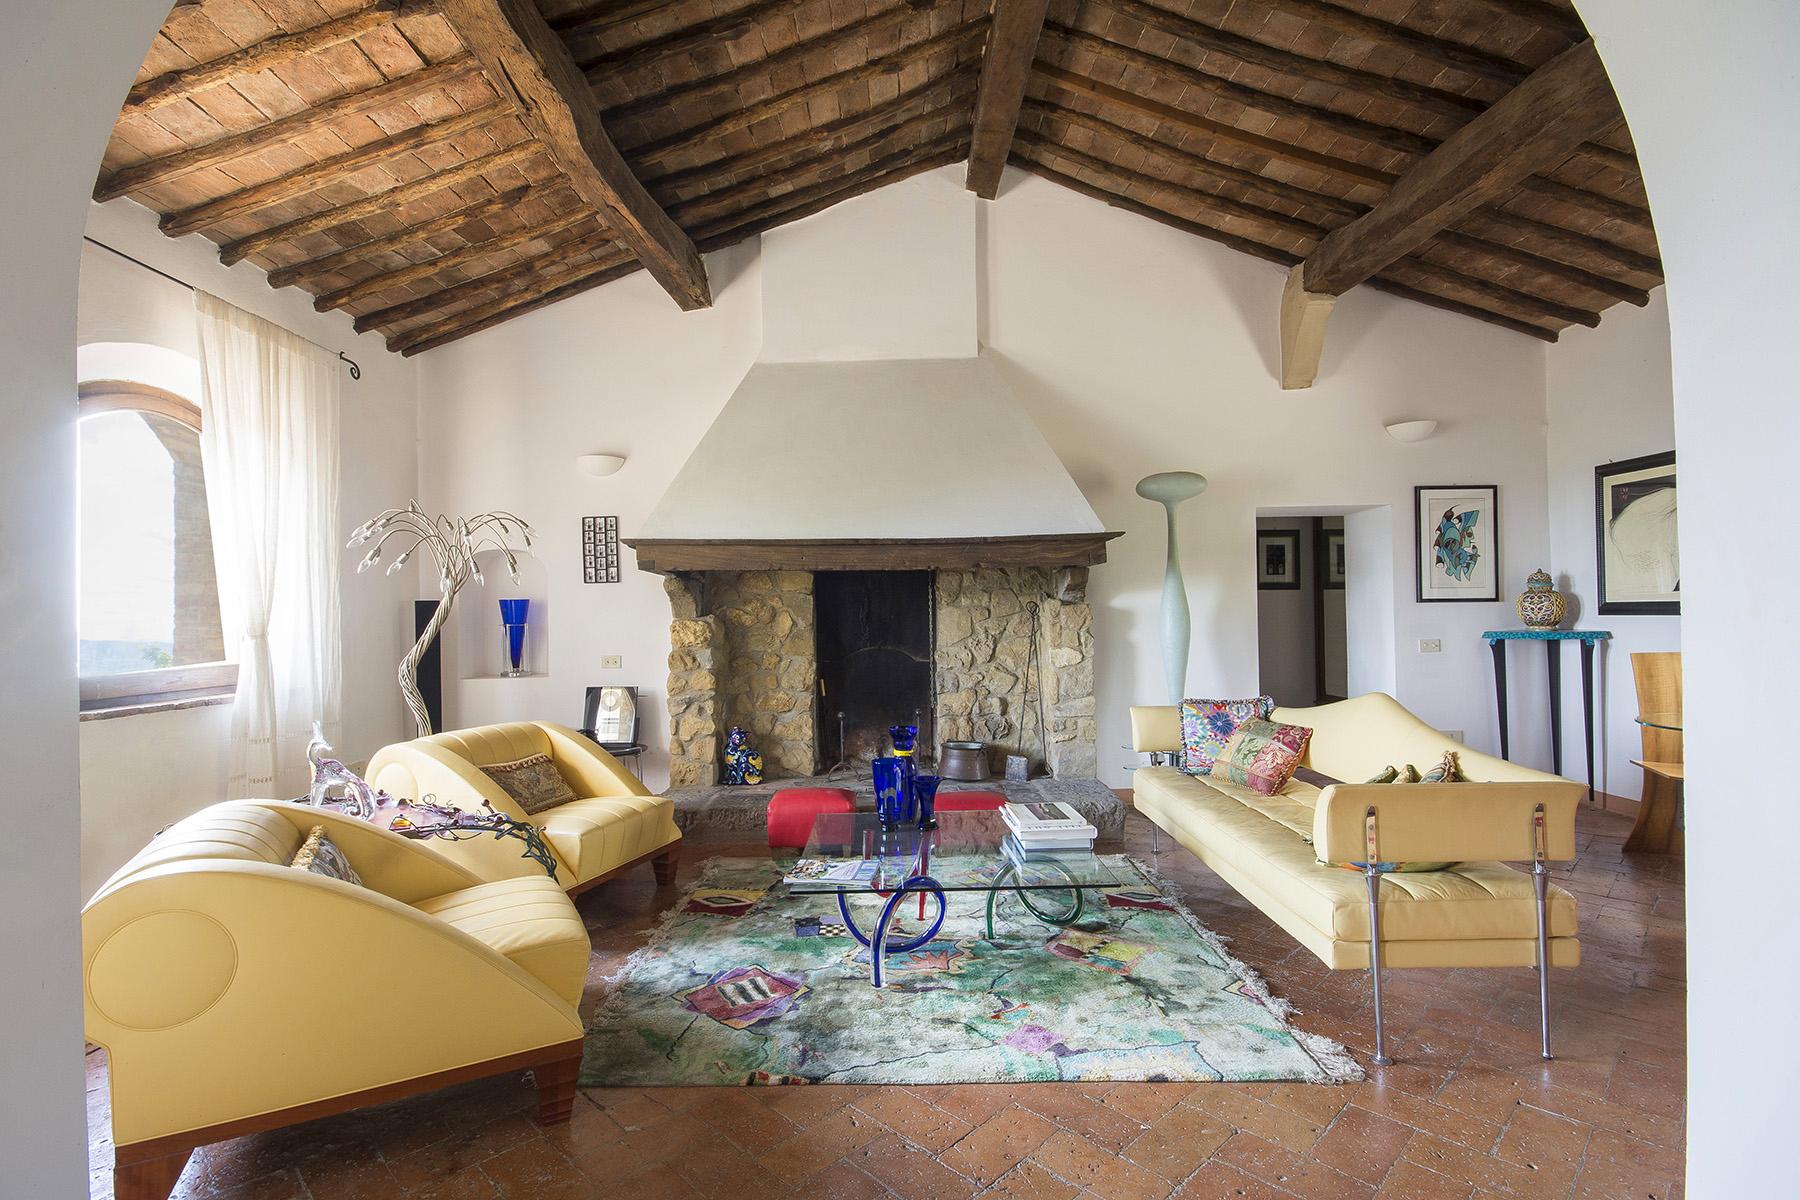 Casa indipendente in Vendita a Pienza: 5 locali, 400 mq - Foto 13